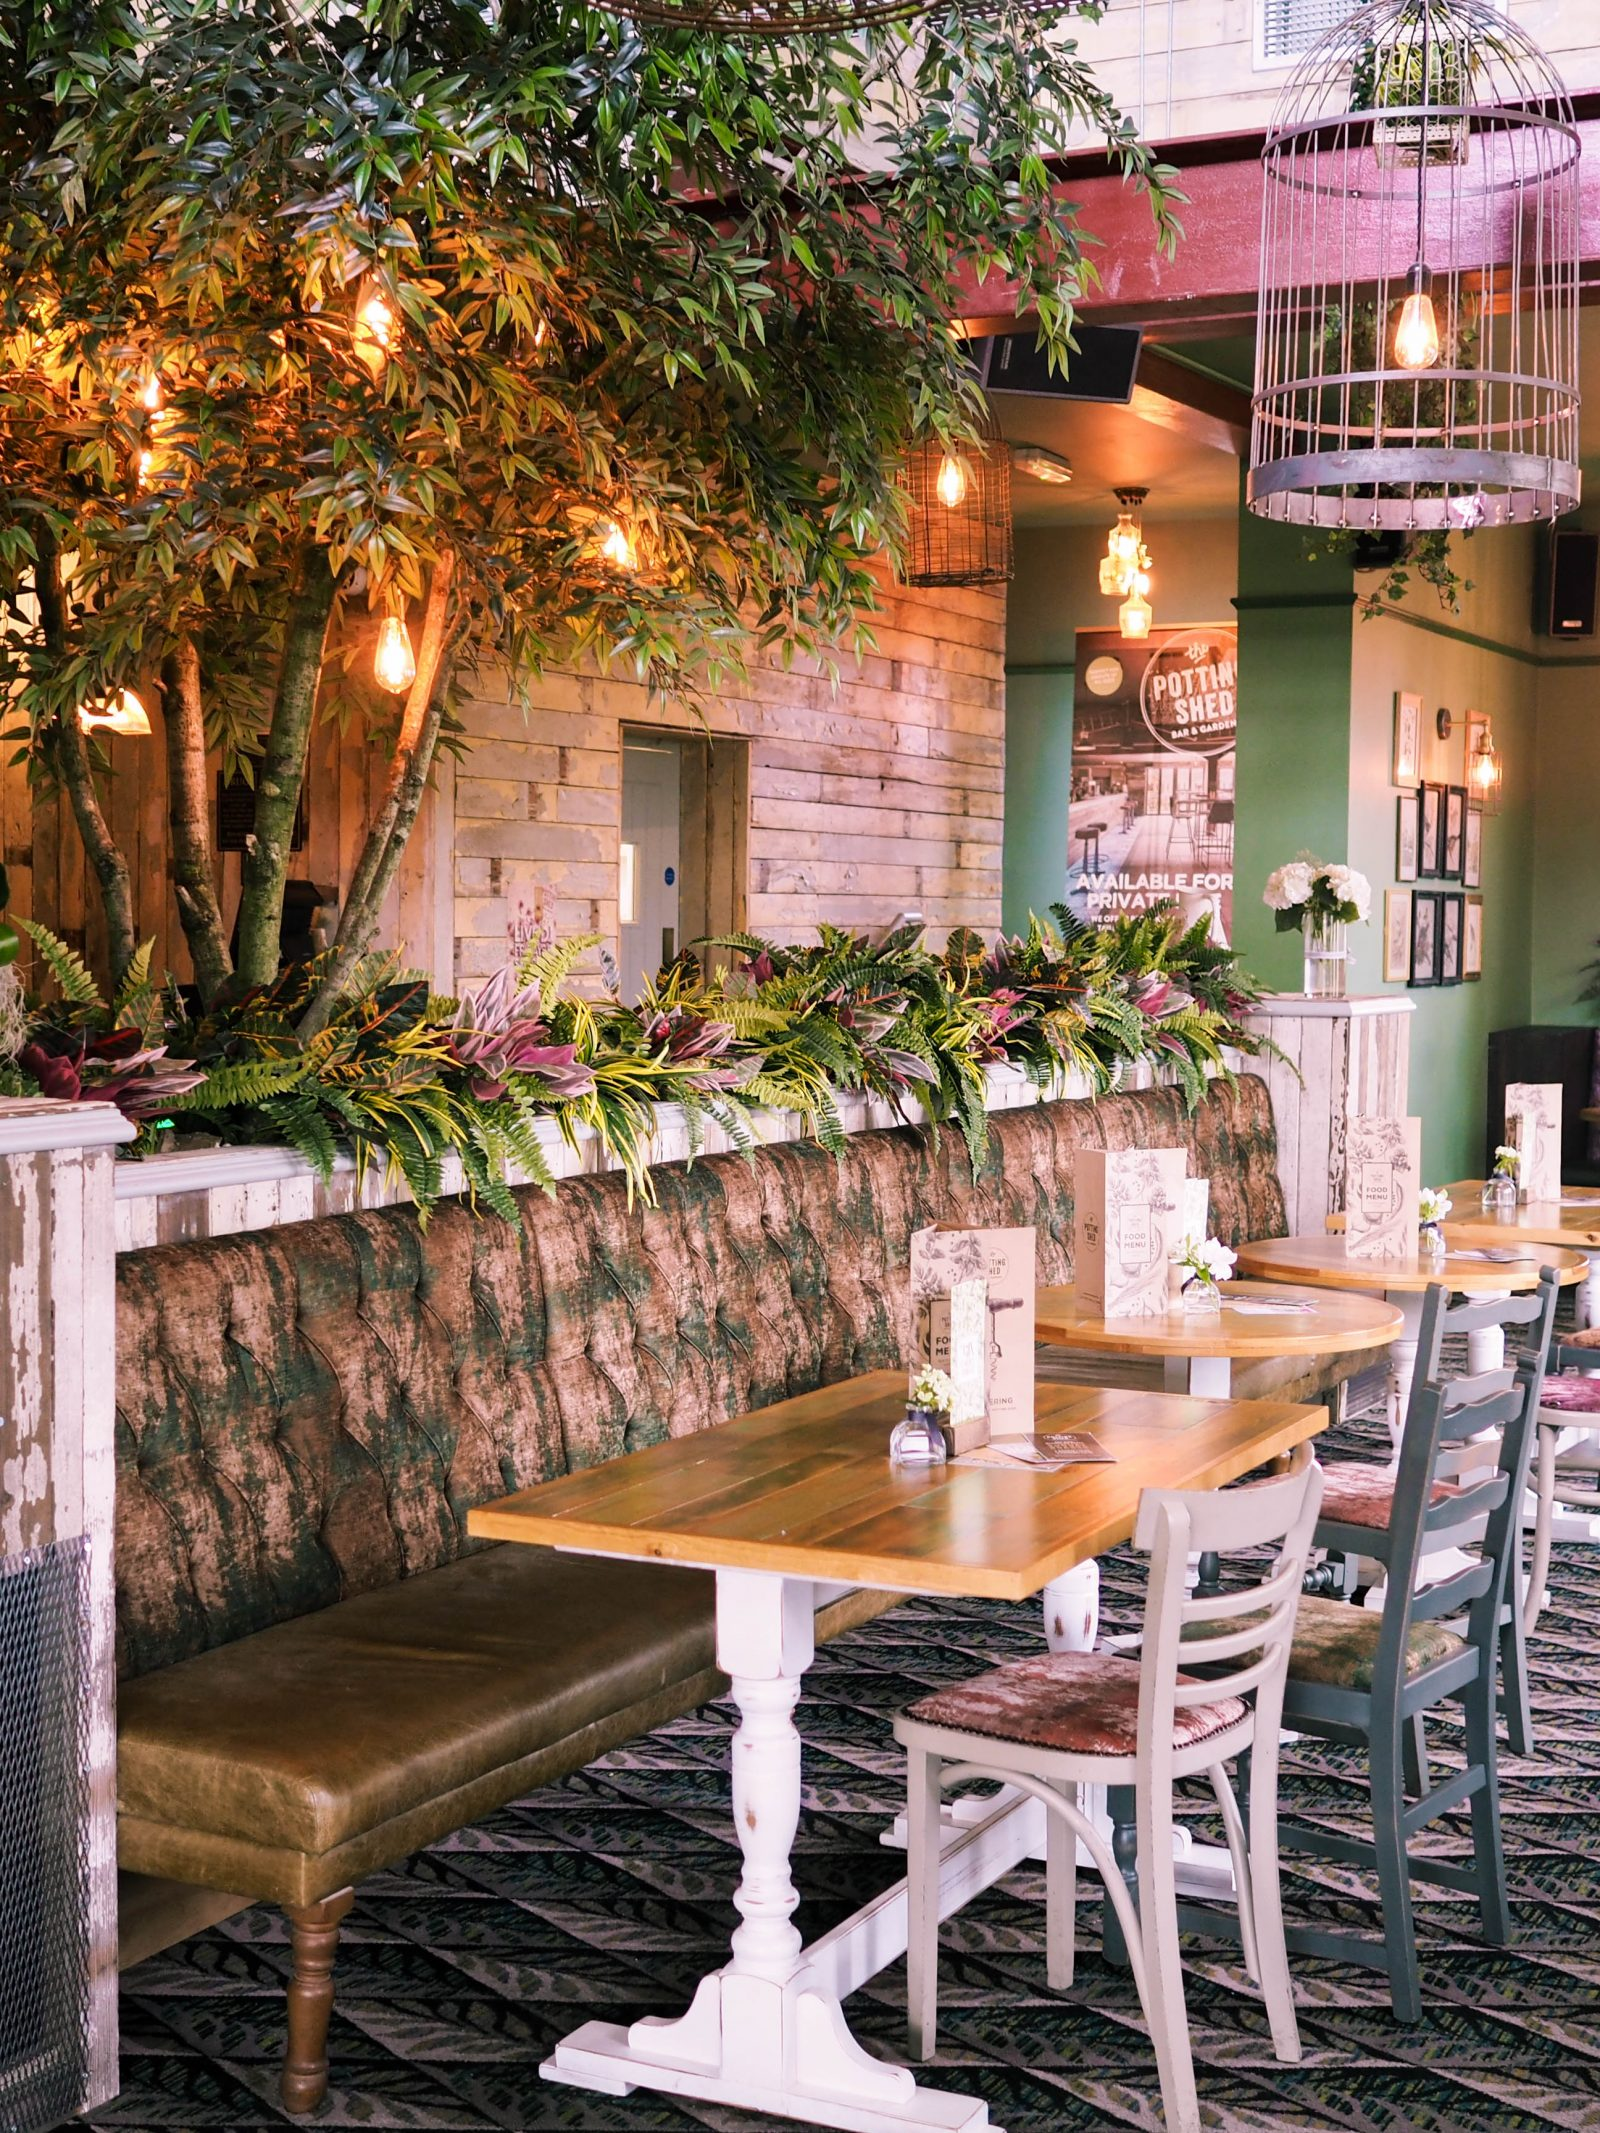 The potting shed guiseley | rhianna olivia